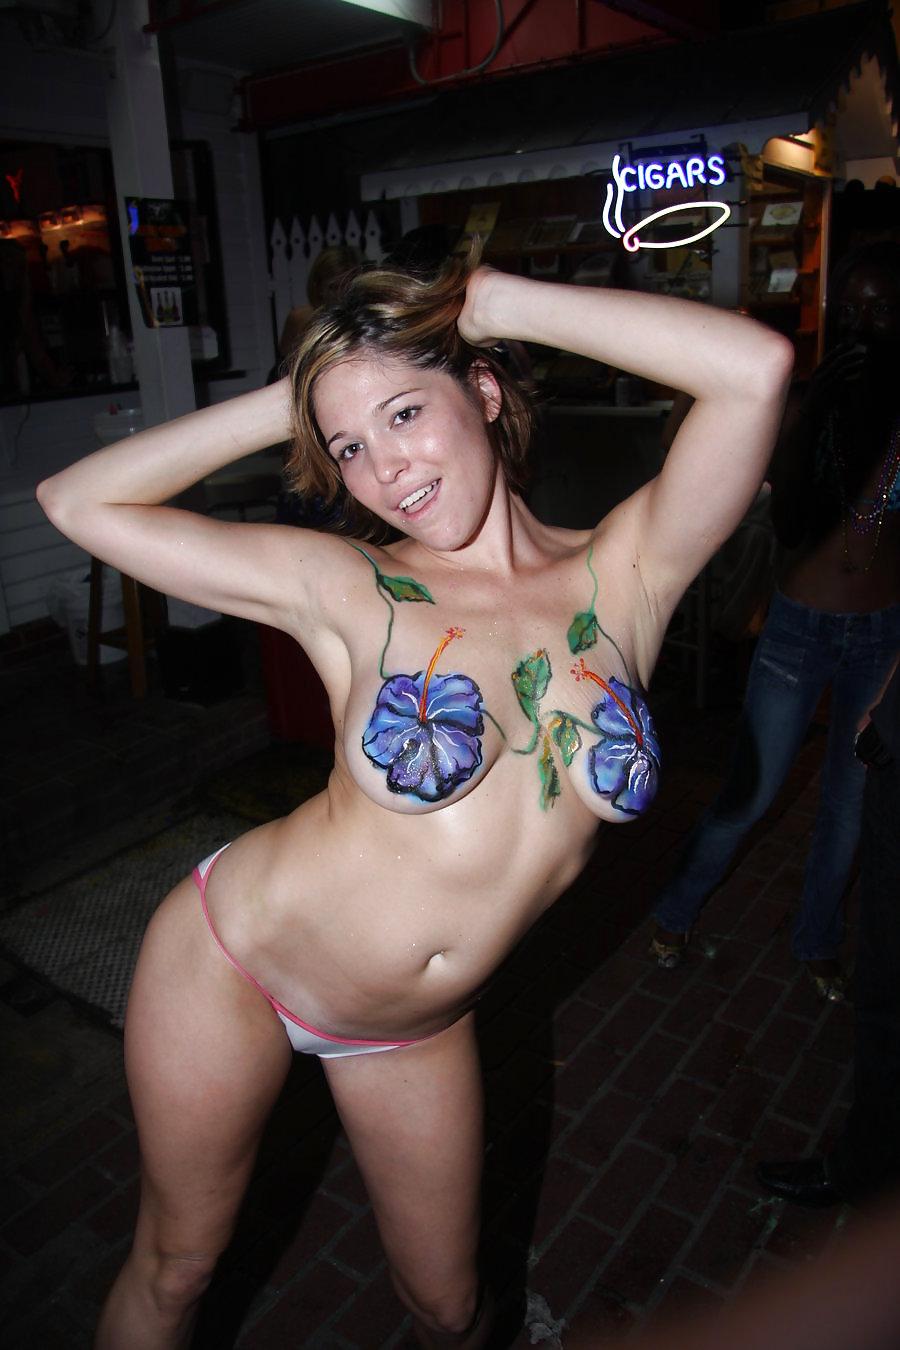 Amateur Flashing and Public nudity #5347346